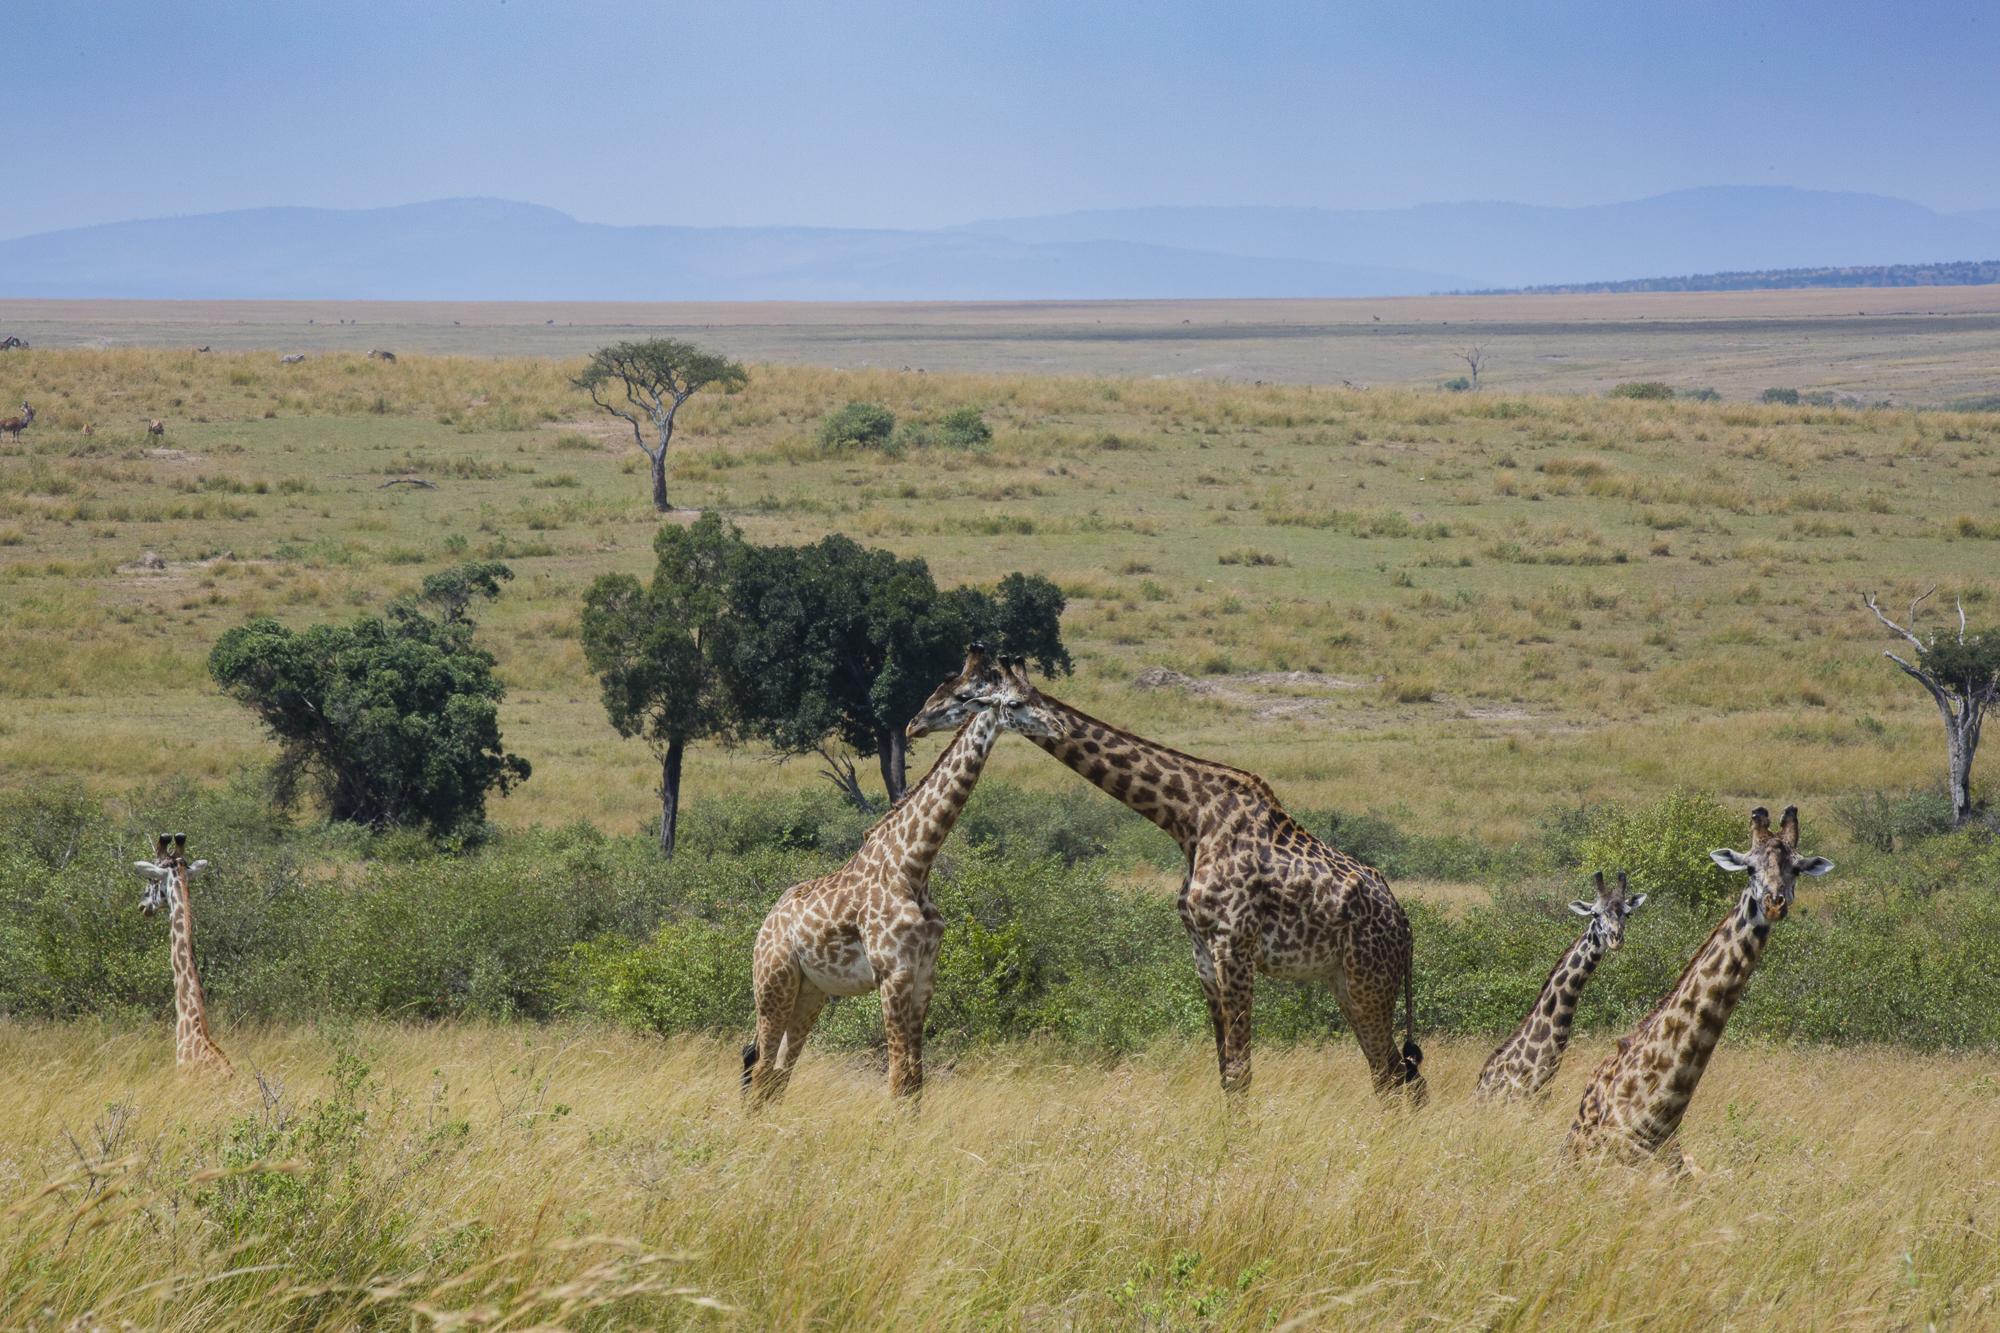 A herd of giraffes in the Maasai Mara National Reserve in Kenya.